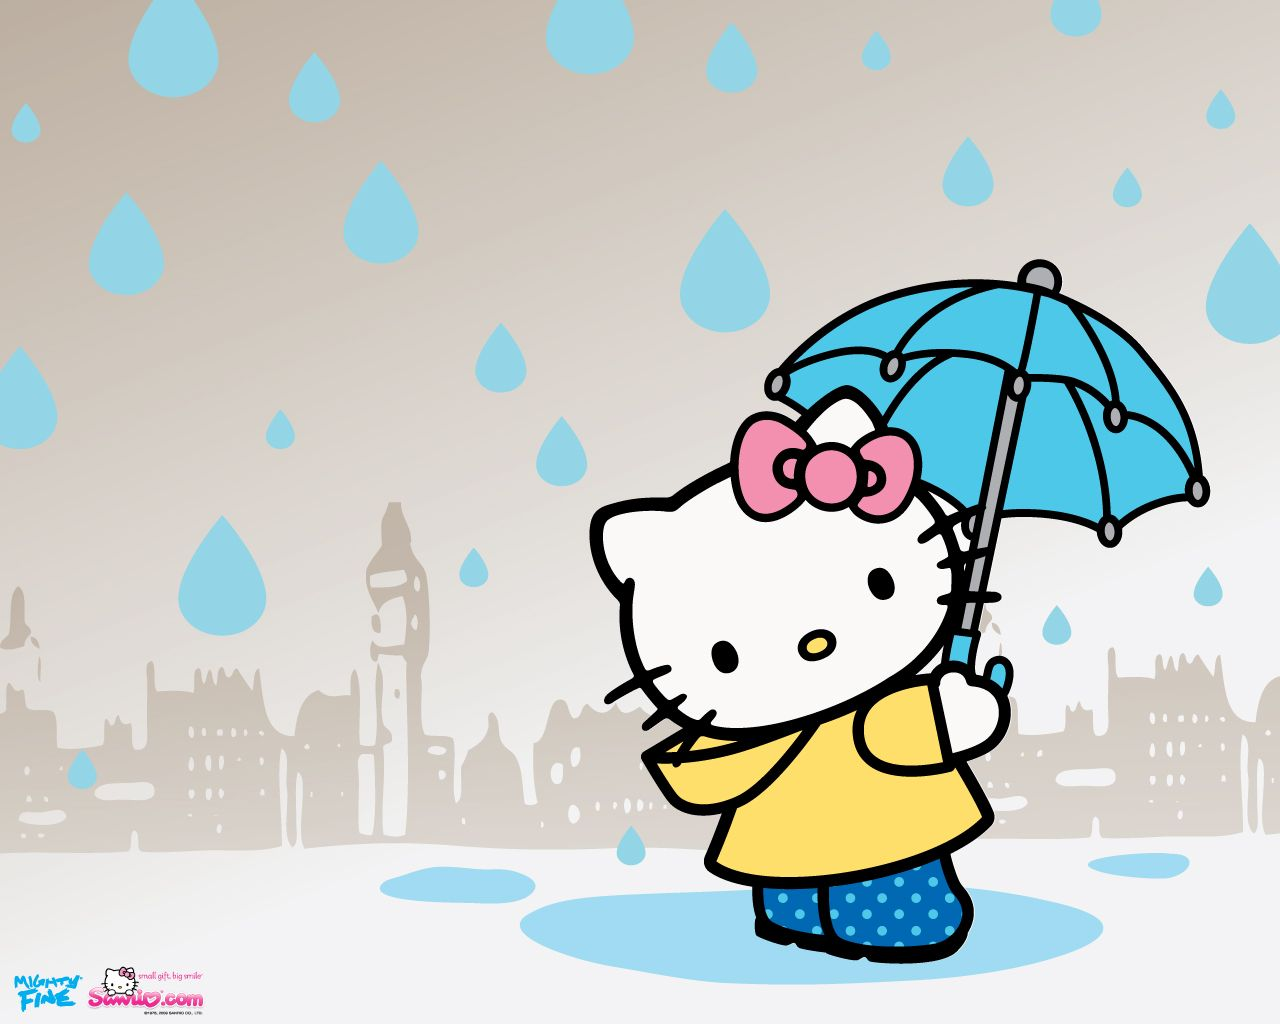 Most Inspiring Wallpaper Hello Kitty Facebook - 5a3635fcfa62ae493198b5ca941c746c  Gallery_878490.jpg